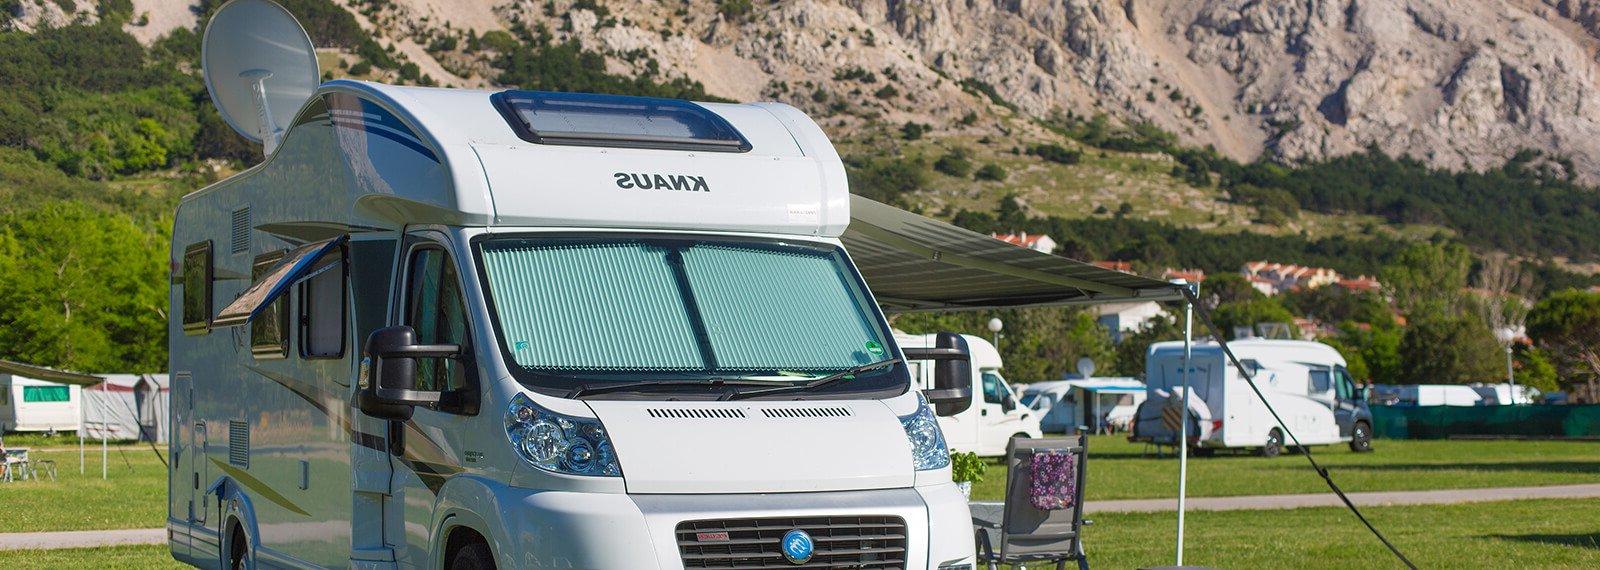 Campingplatze Zablaće standard stellplatz | AdriaCamps